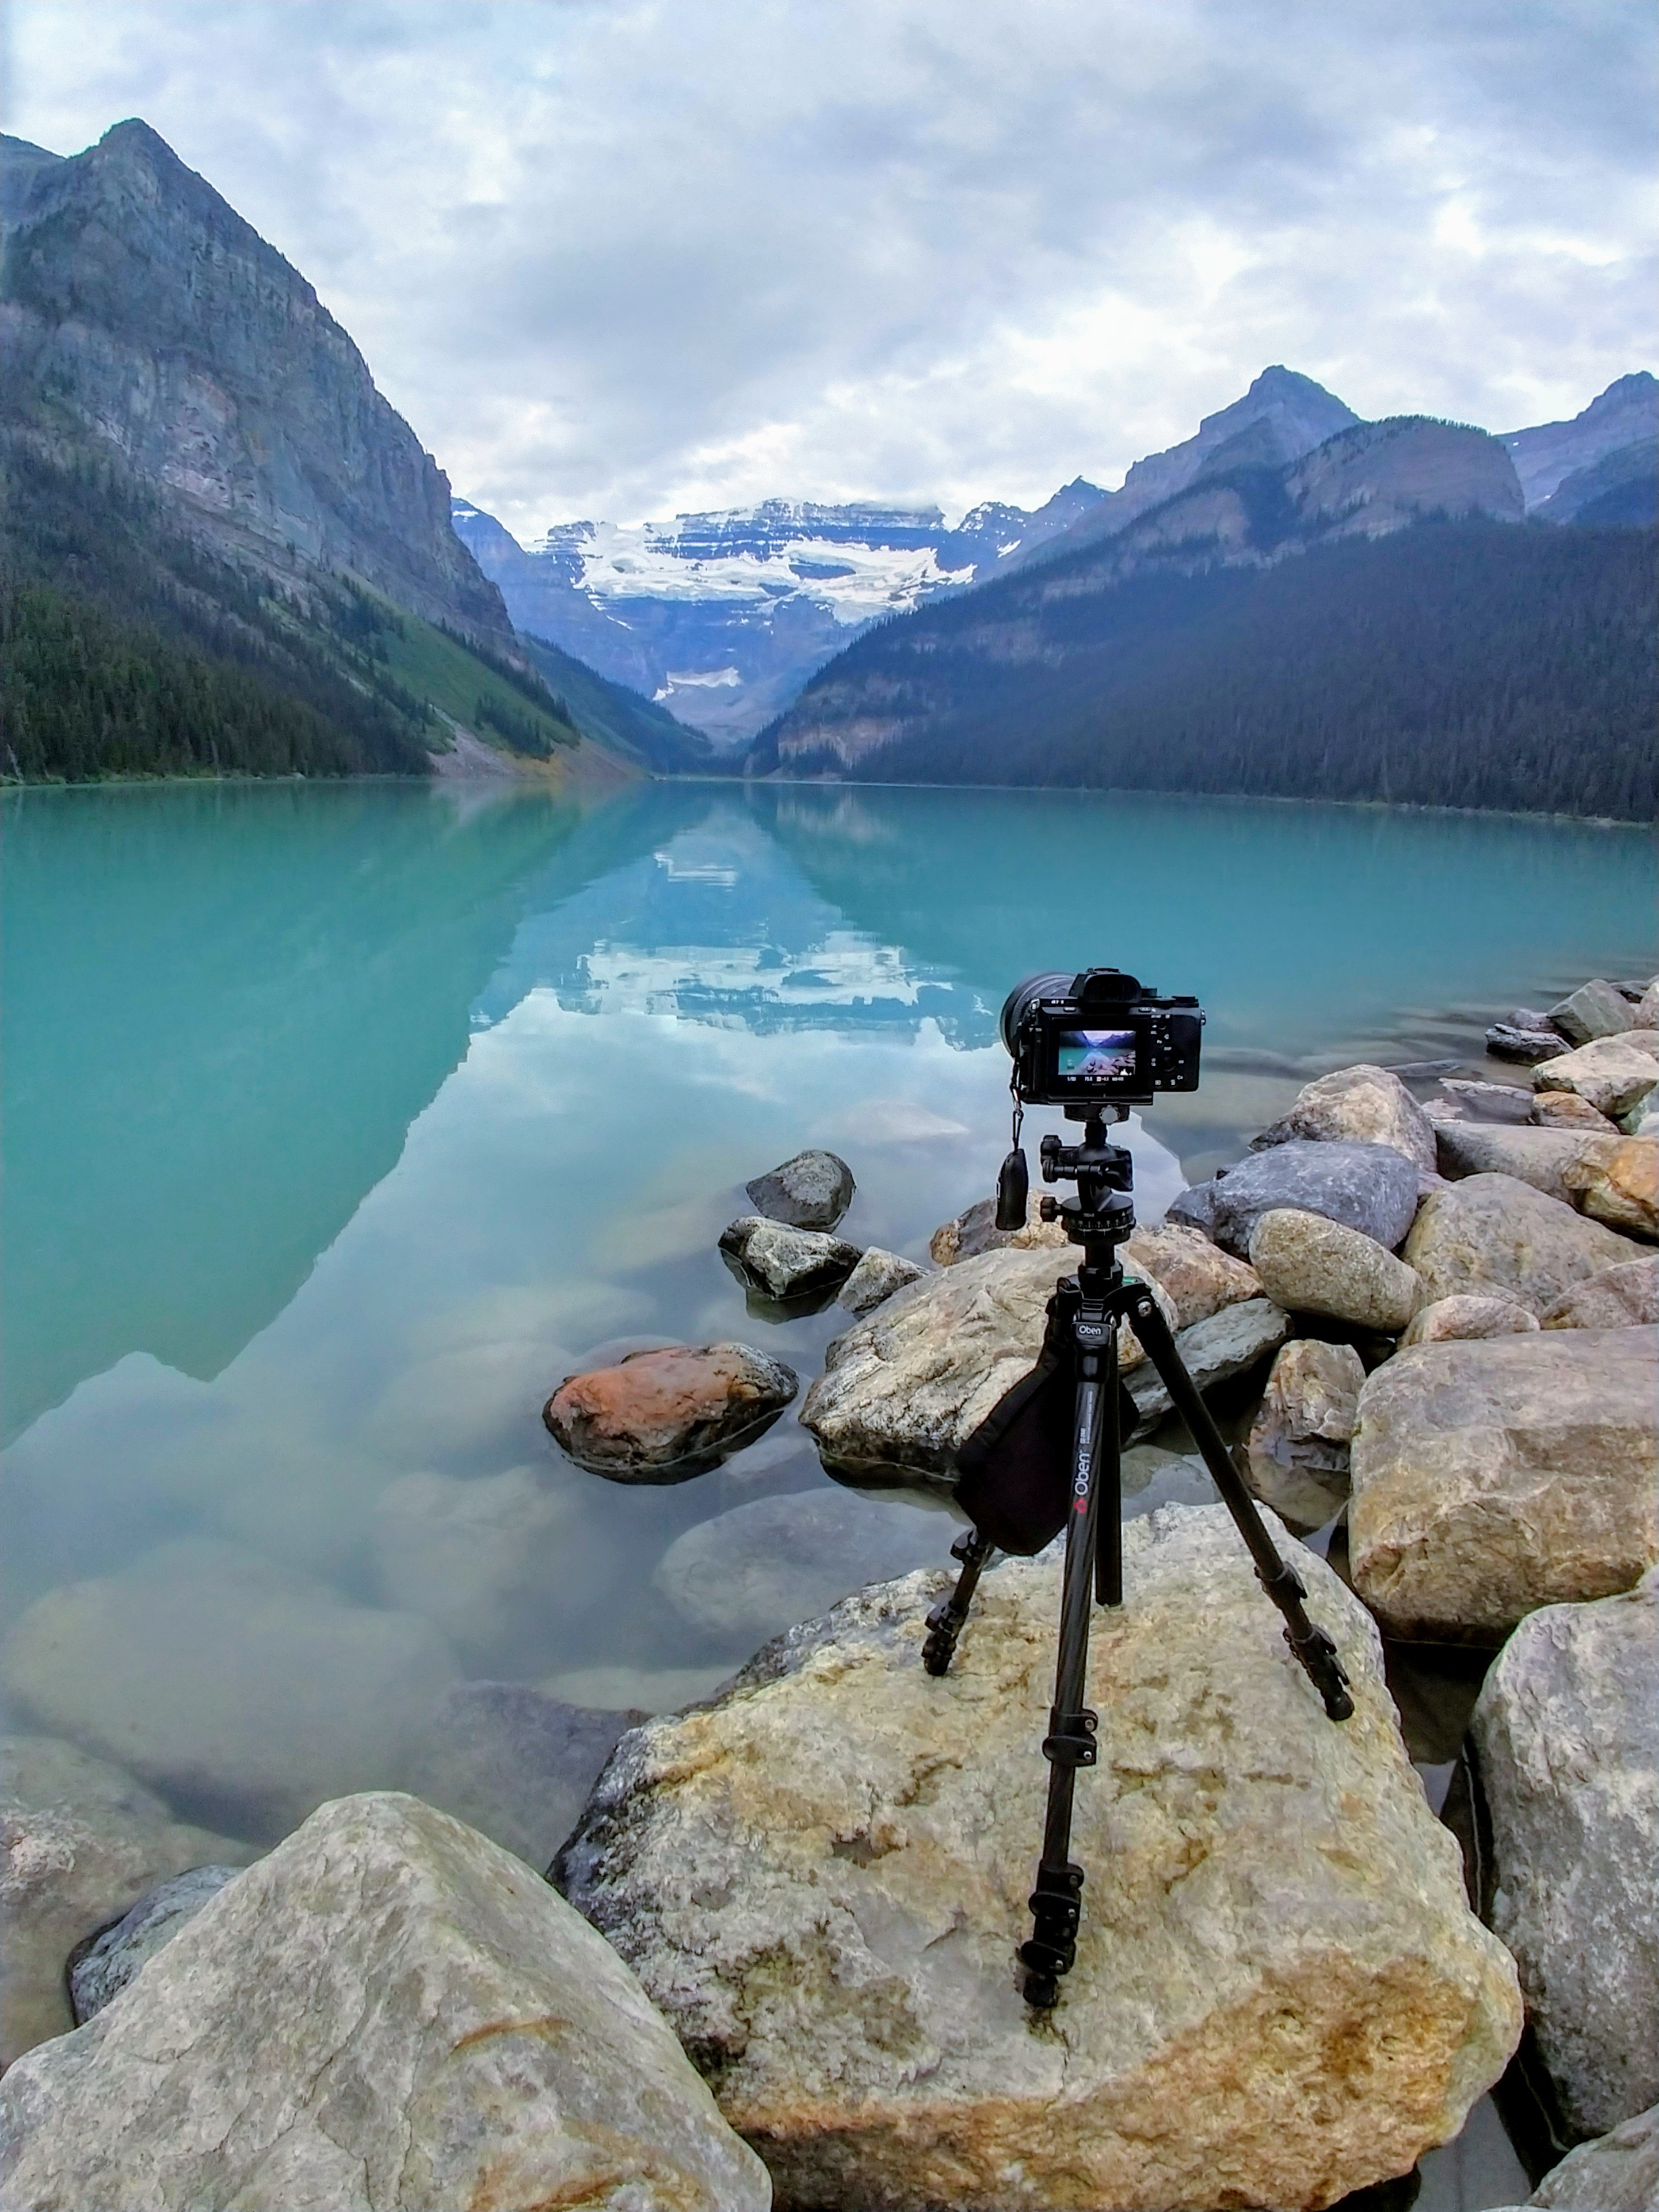 Photographing at Lake Louise. © Paul Nguyen